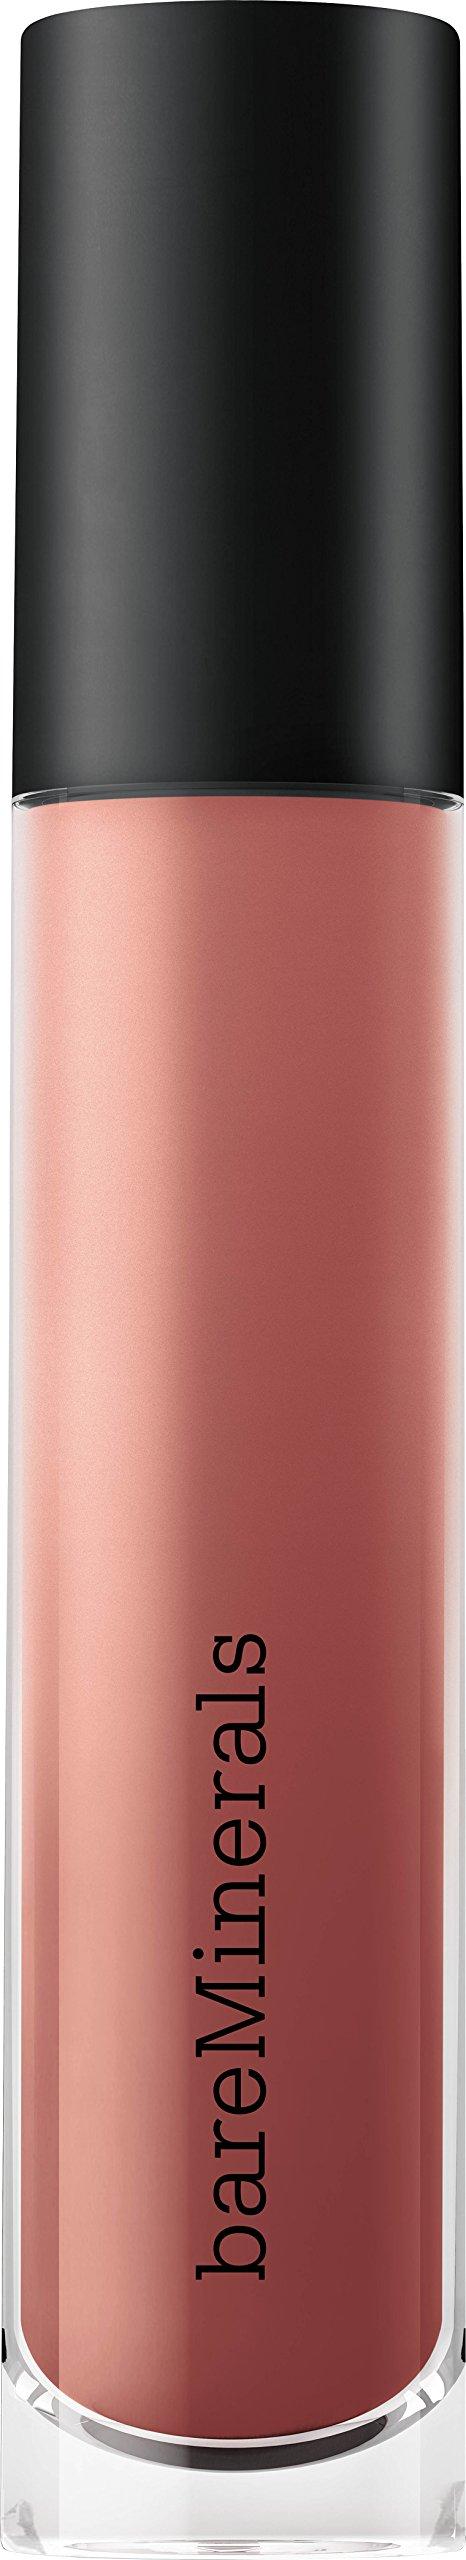 bareMinerals Gen Nude Matte Liquid Lip Color, Boss, 0.13 Fluid Ounce